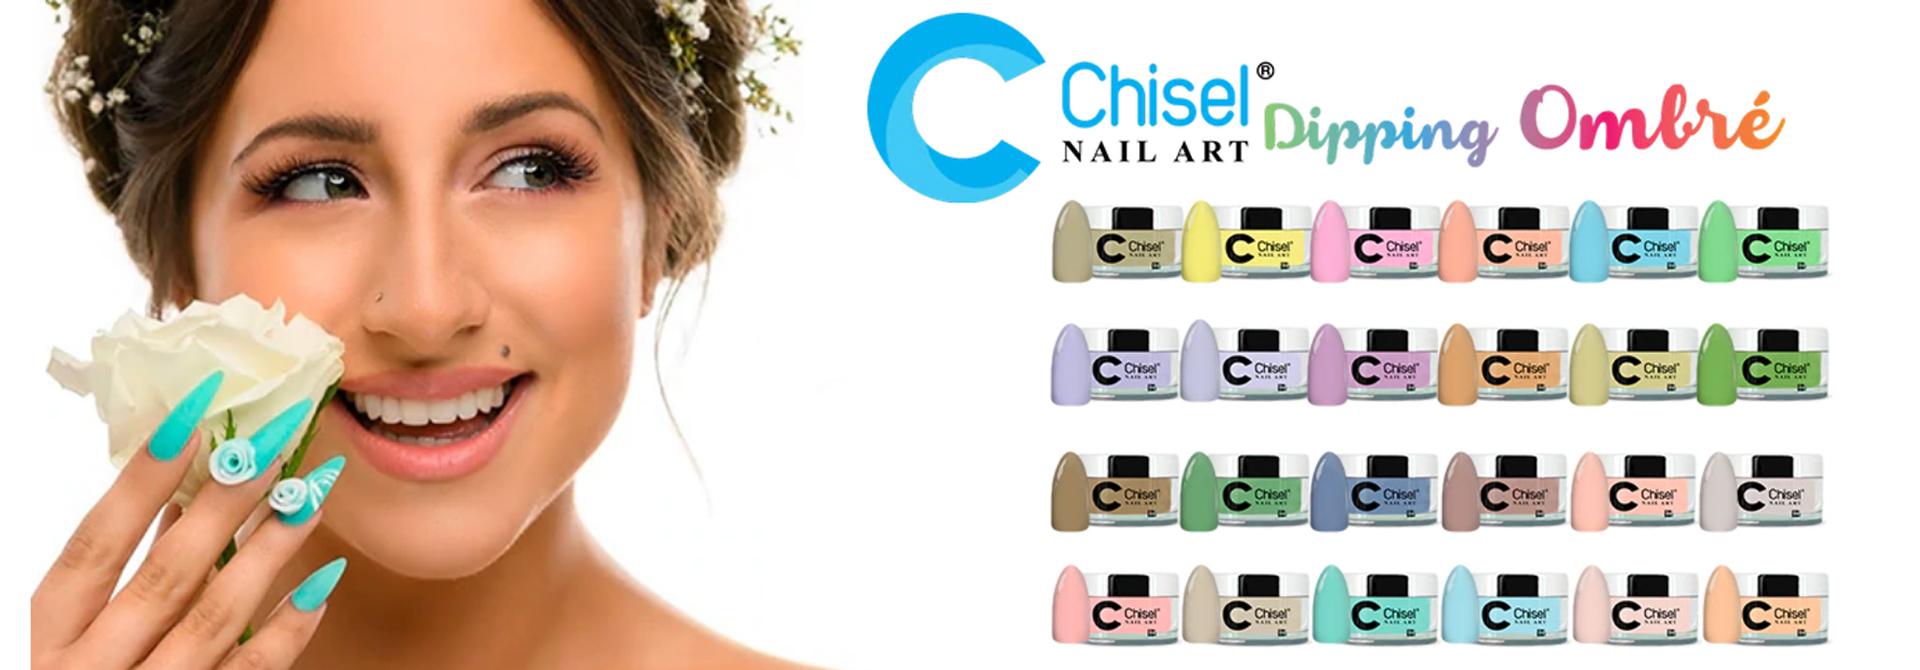 chisel1.jpg